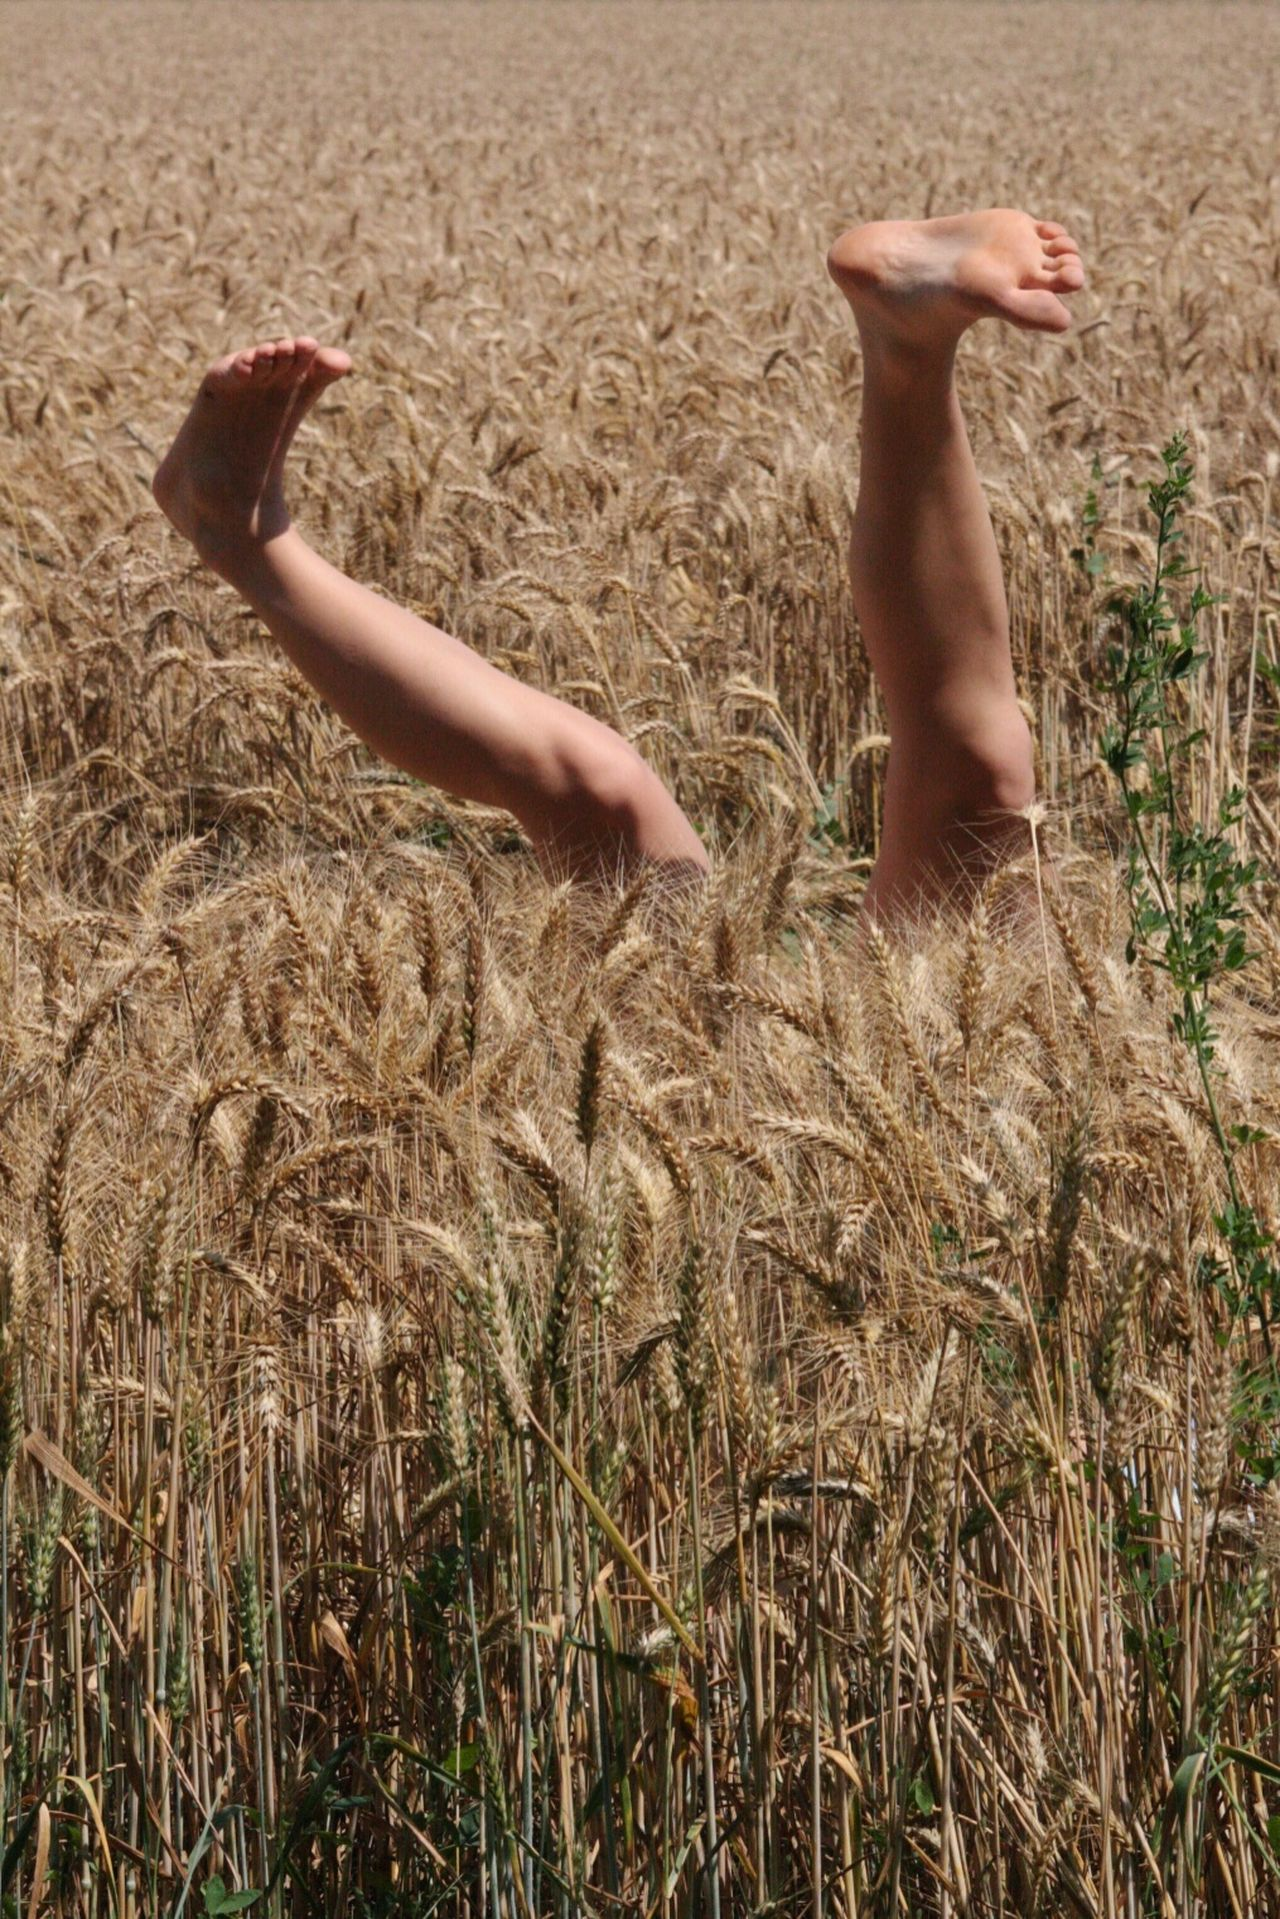 Aliens Signals Corn Field Legs Resistance